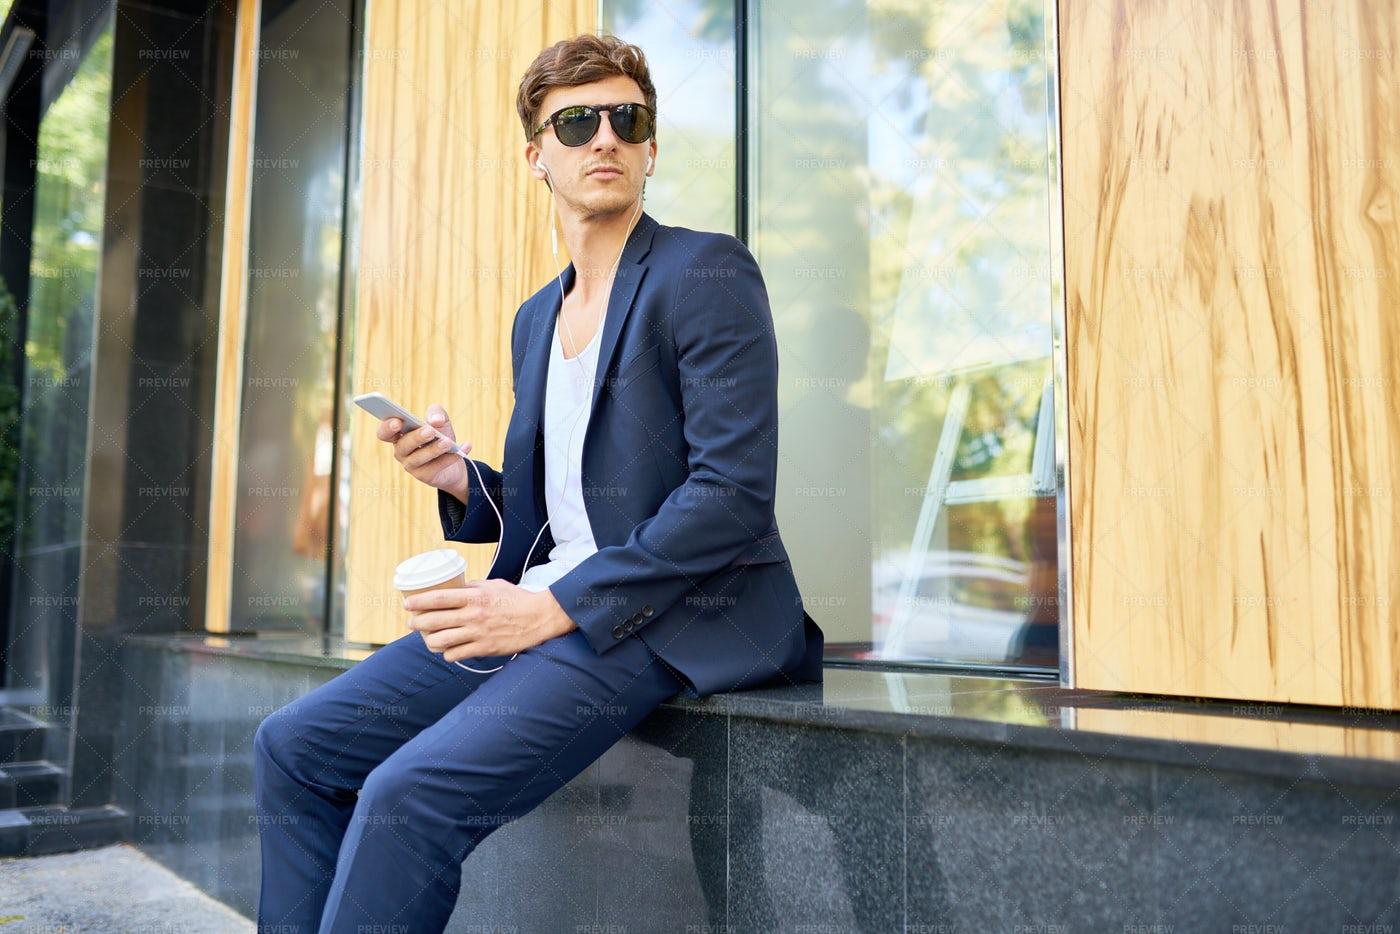 Stylish  Handsome Man Holding...: Stock Photos